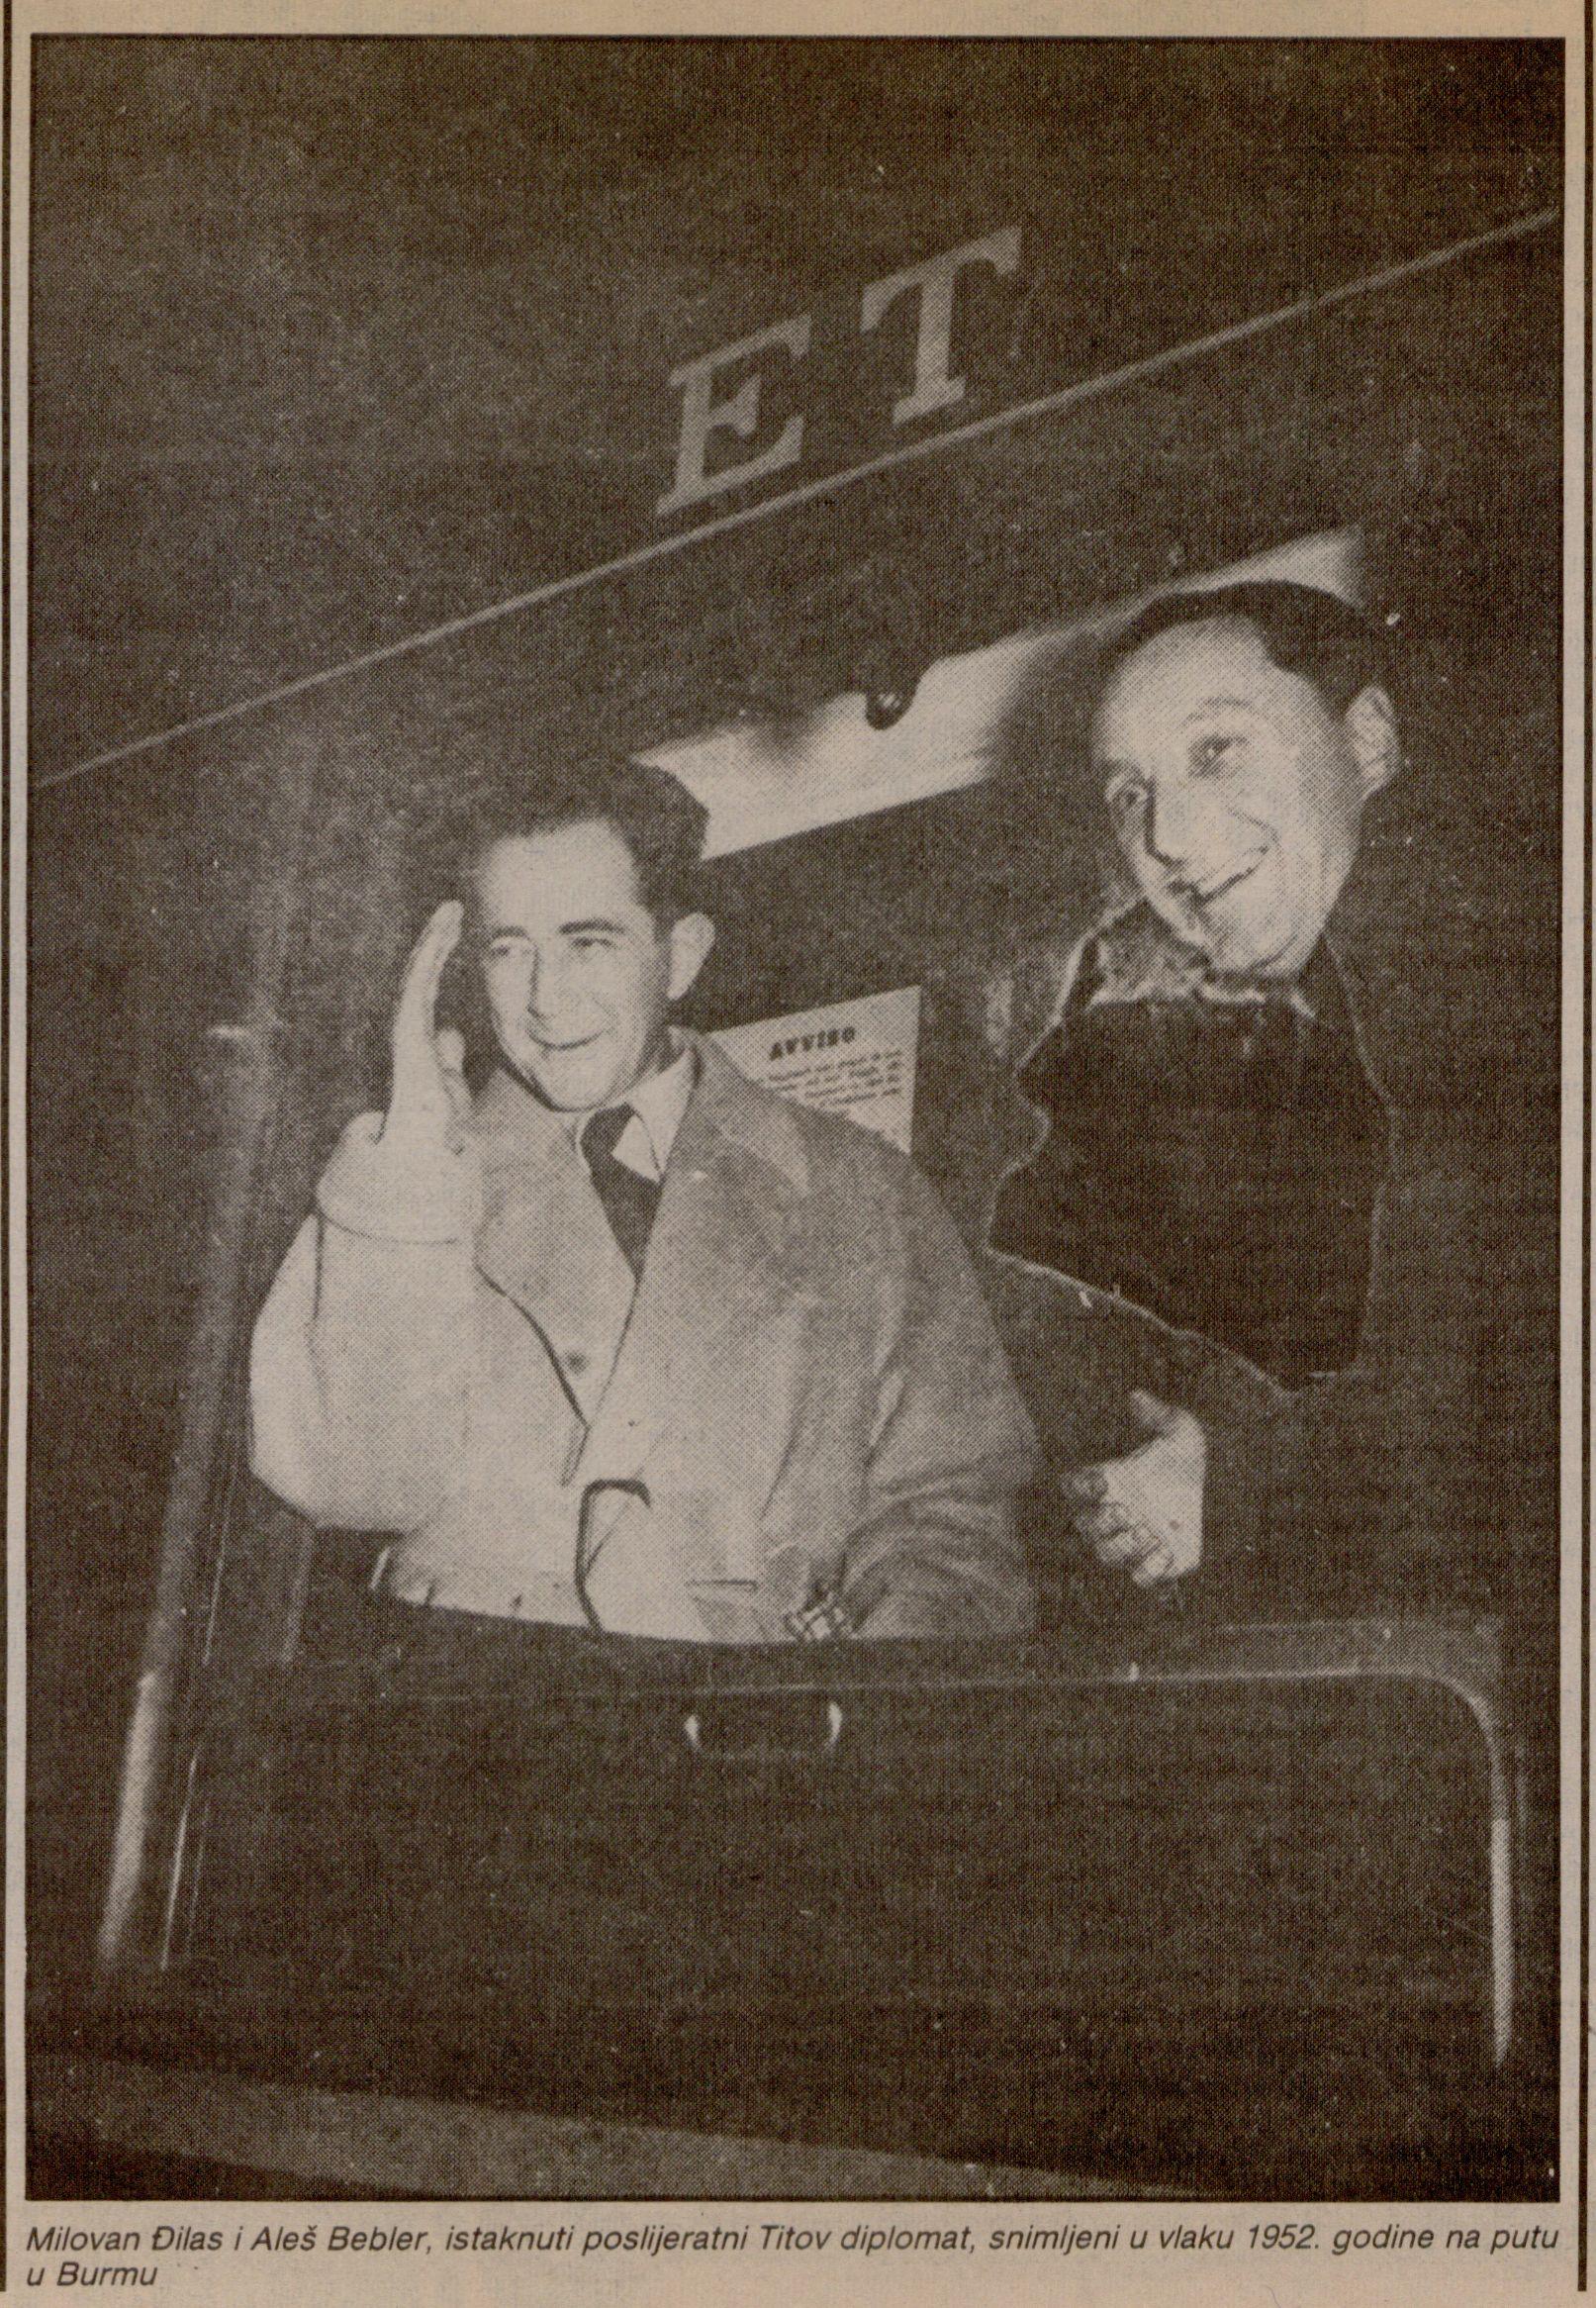 Milovan Djilas in 1952. (HR-HDA-2031. Vjesnik, Public persons, Milovan Djilas personal file)